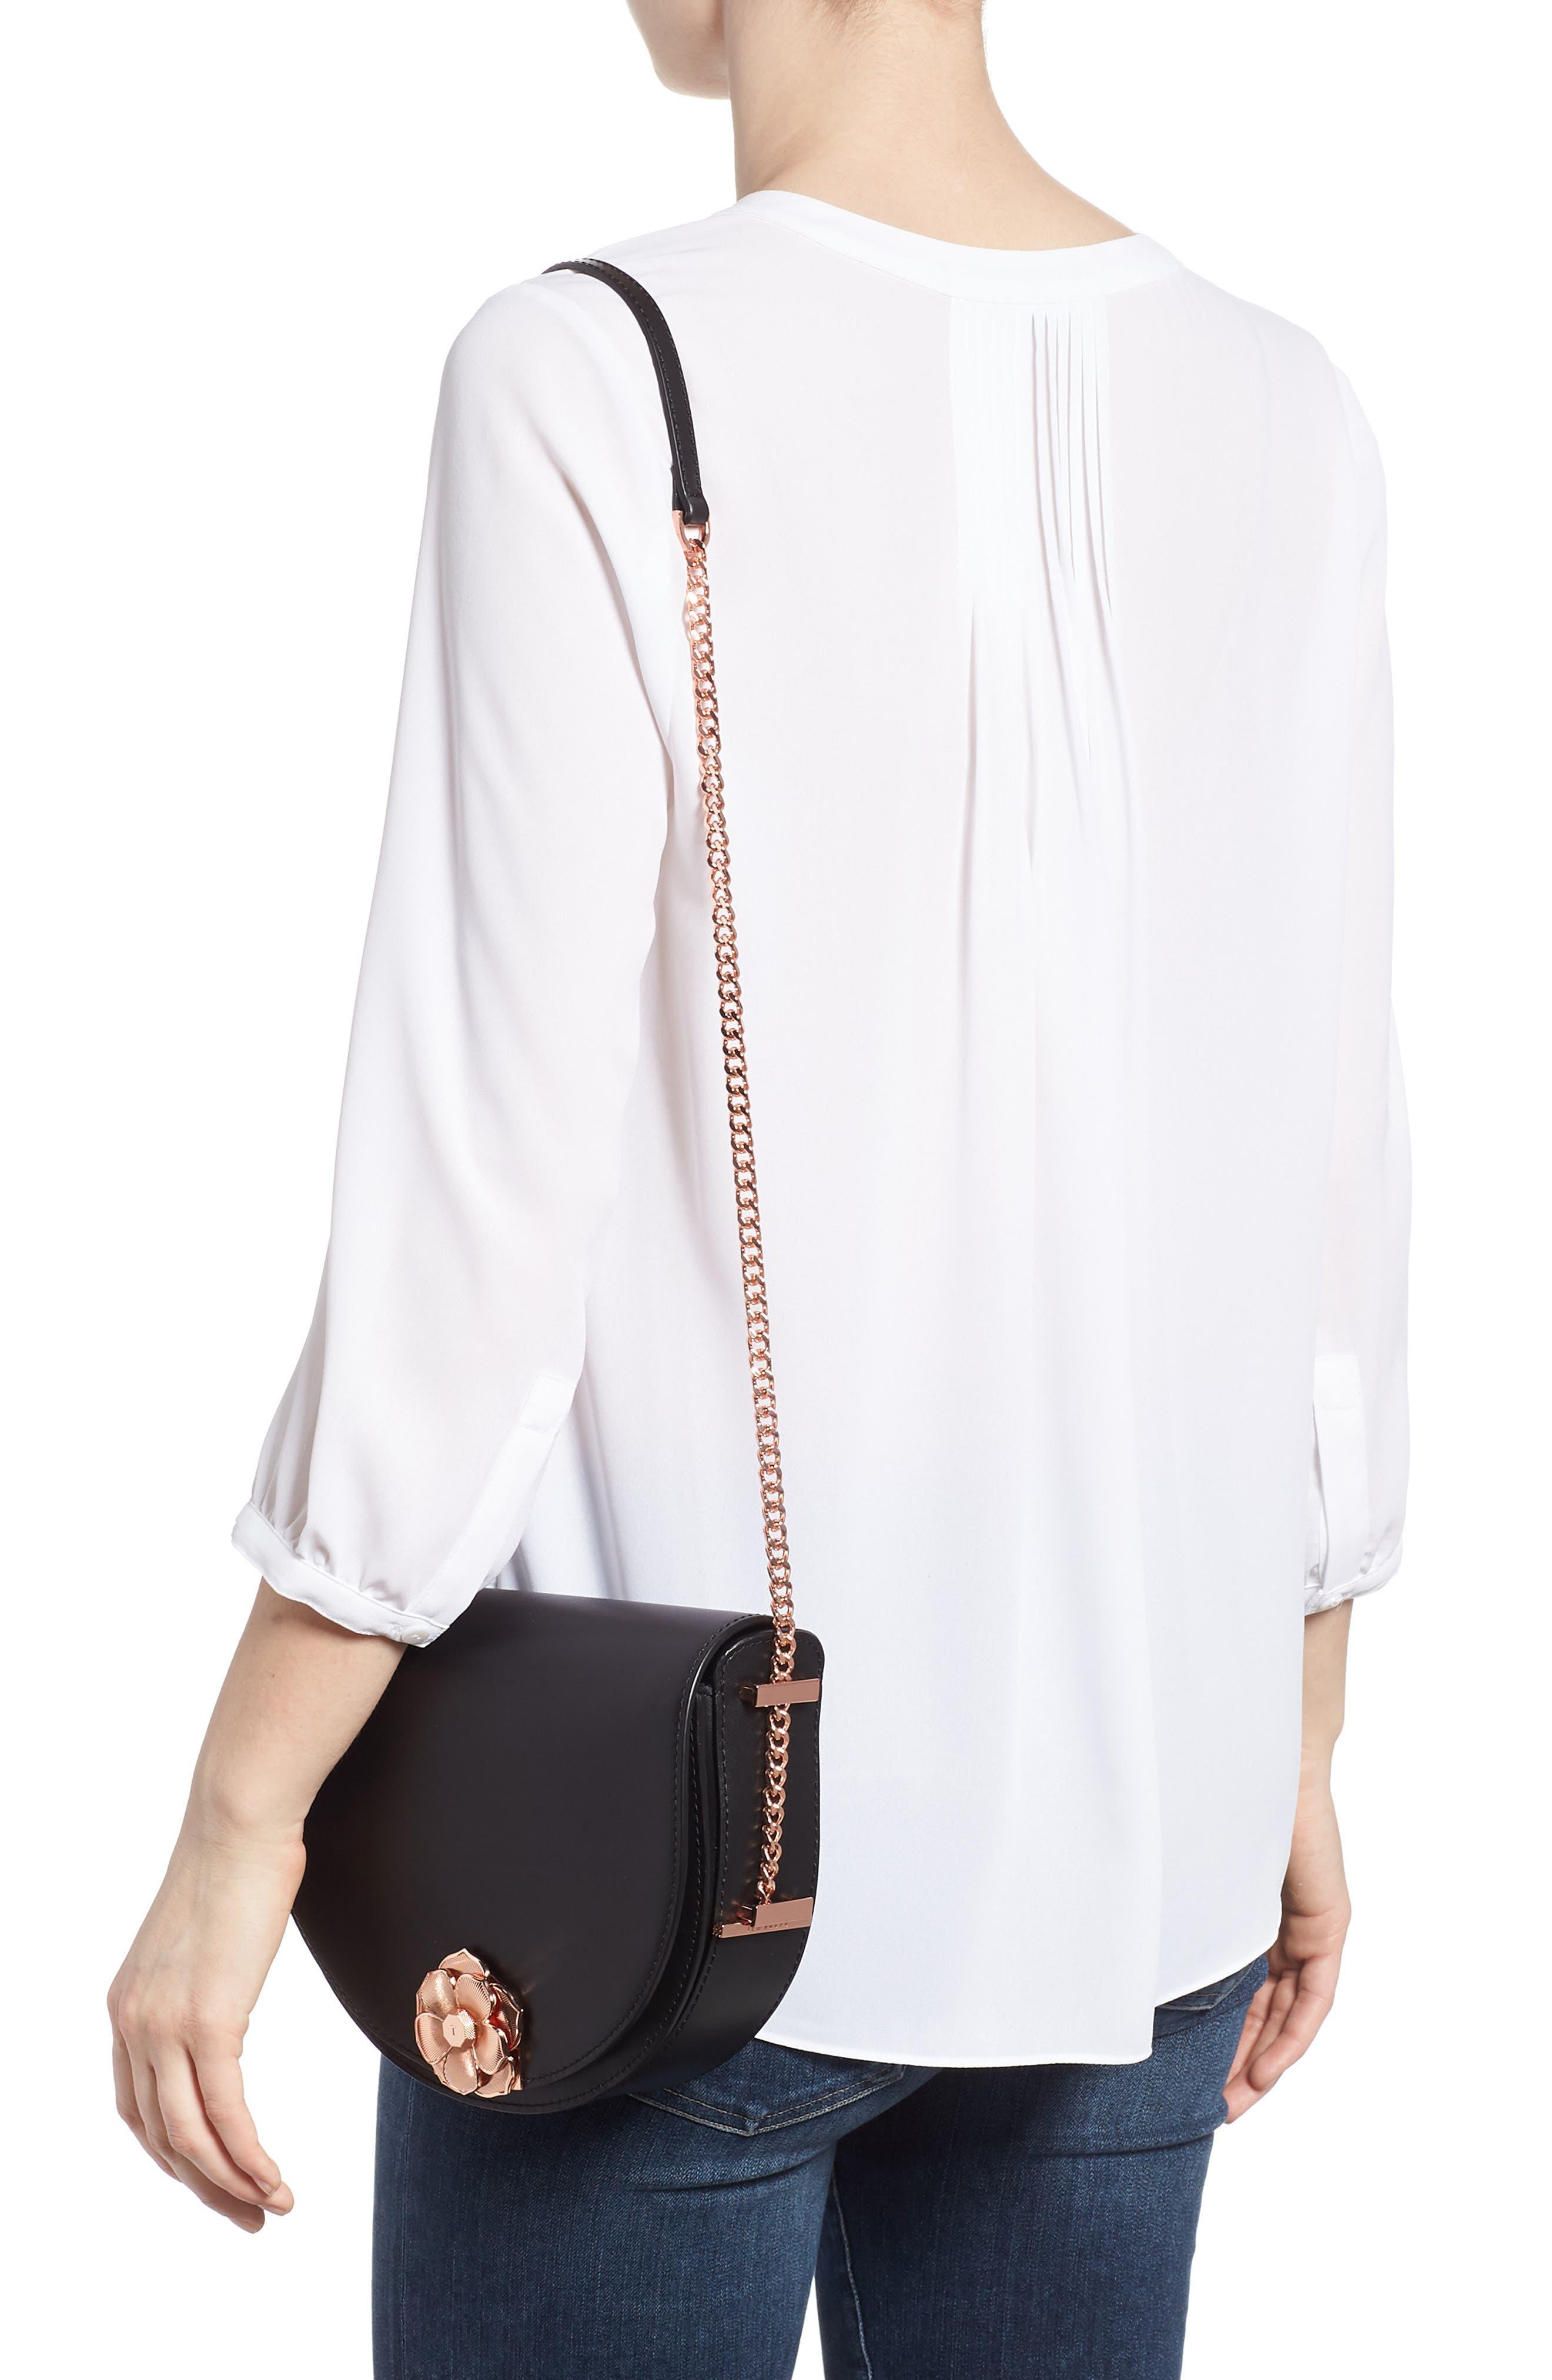 Roslyn Leather Crossbody Bag,                             Alternate thumbnail 2, color,                             Black